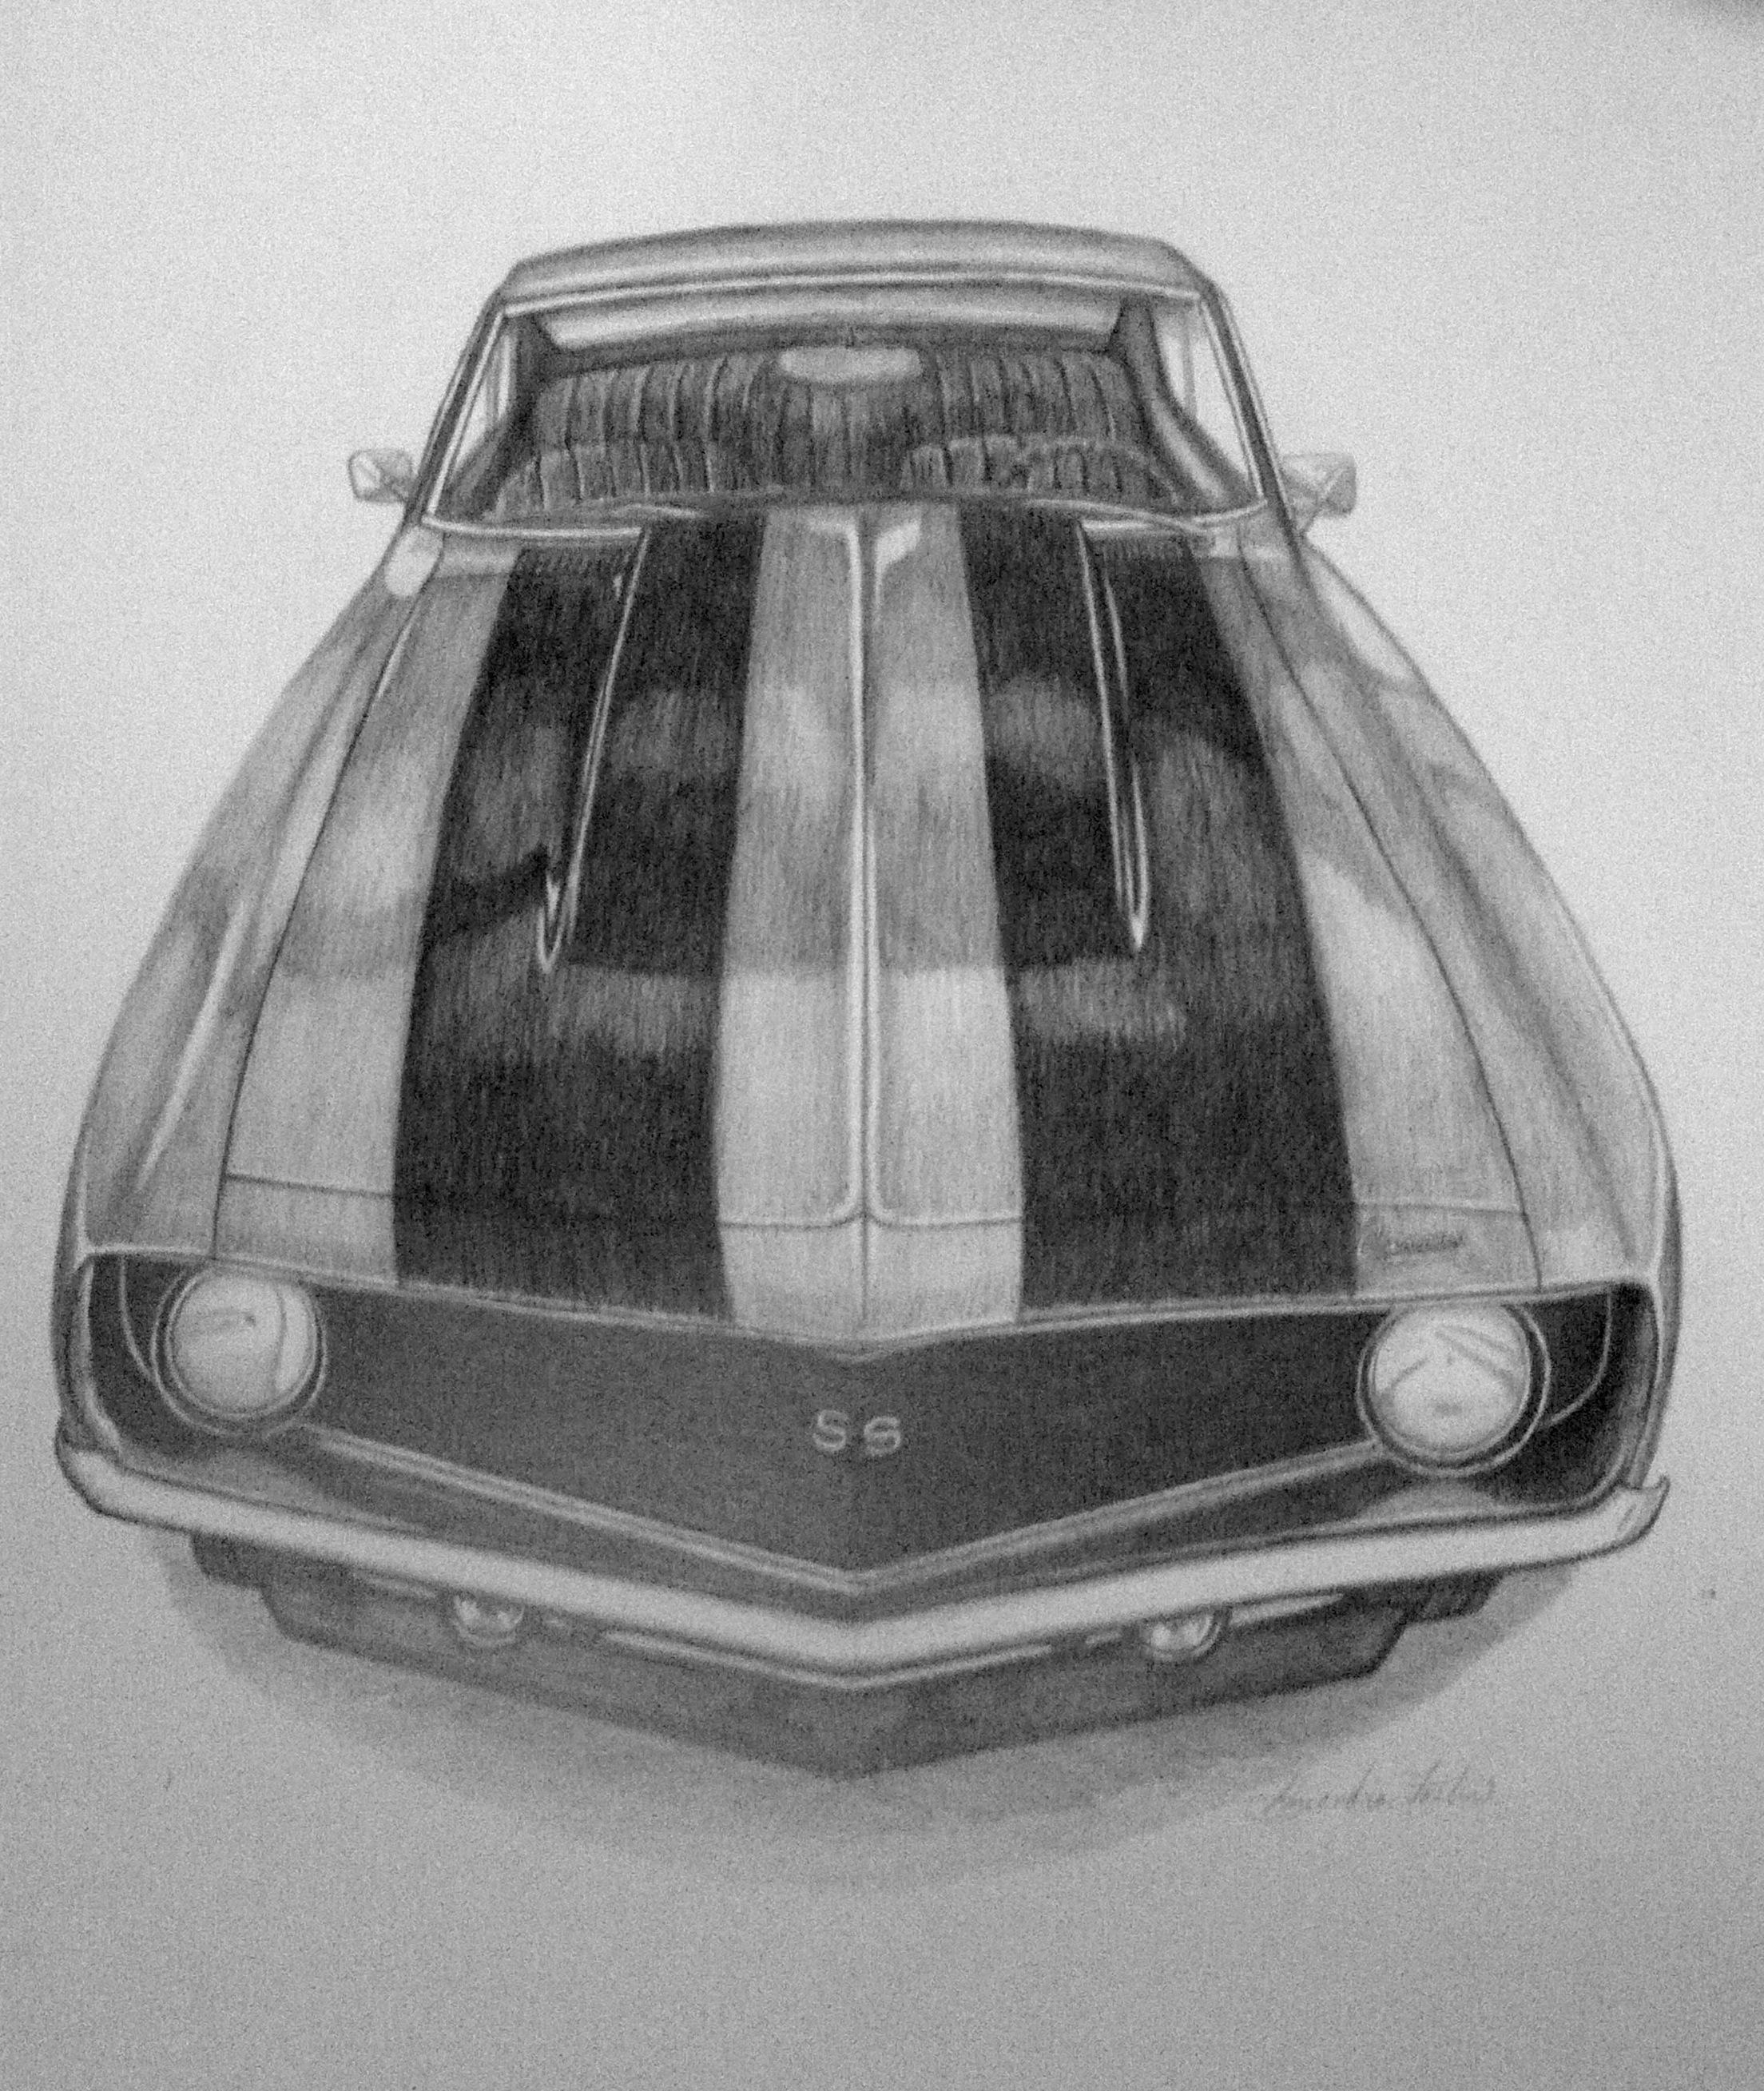 Drawn vehicle camaro ss Board Original on bristol sale!